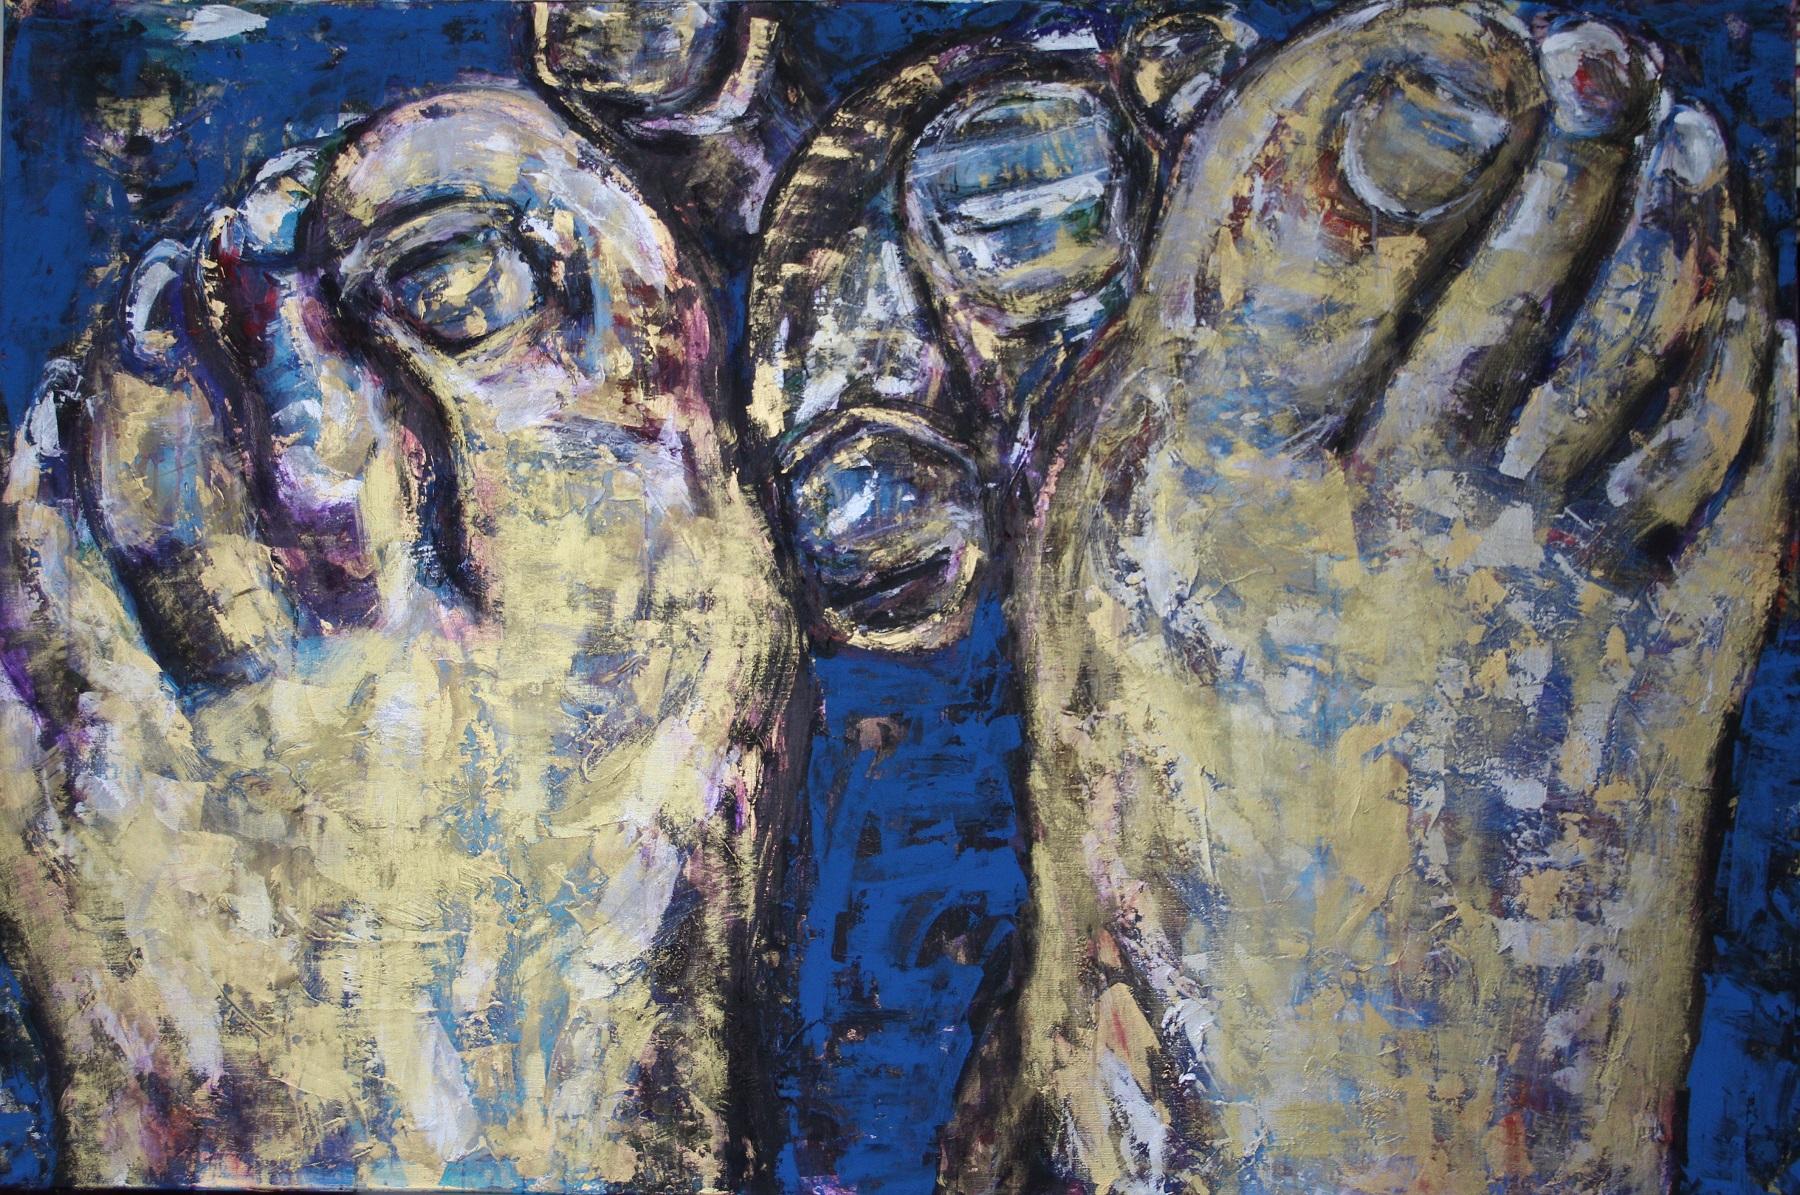 Between Us. 2016. Acrylic on Canvas. 180x120cm